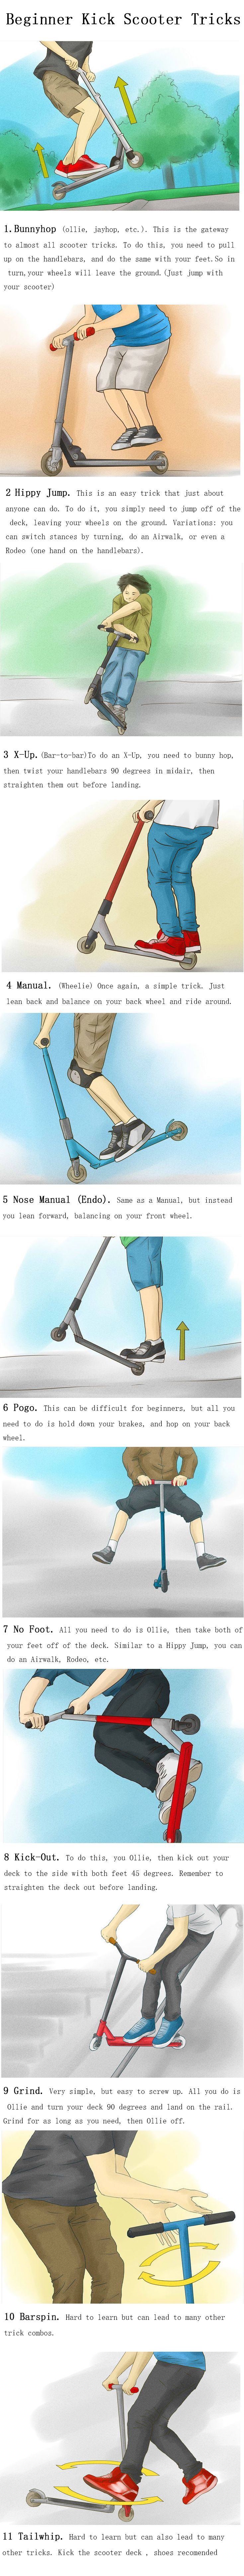 How to Do Beginner Kick Scooter Tricks